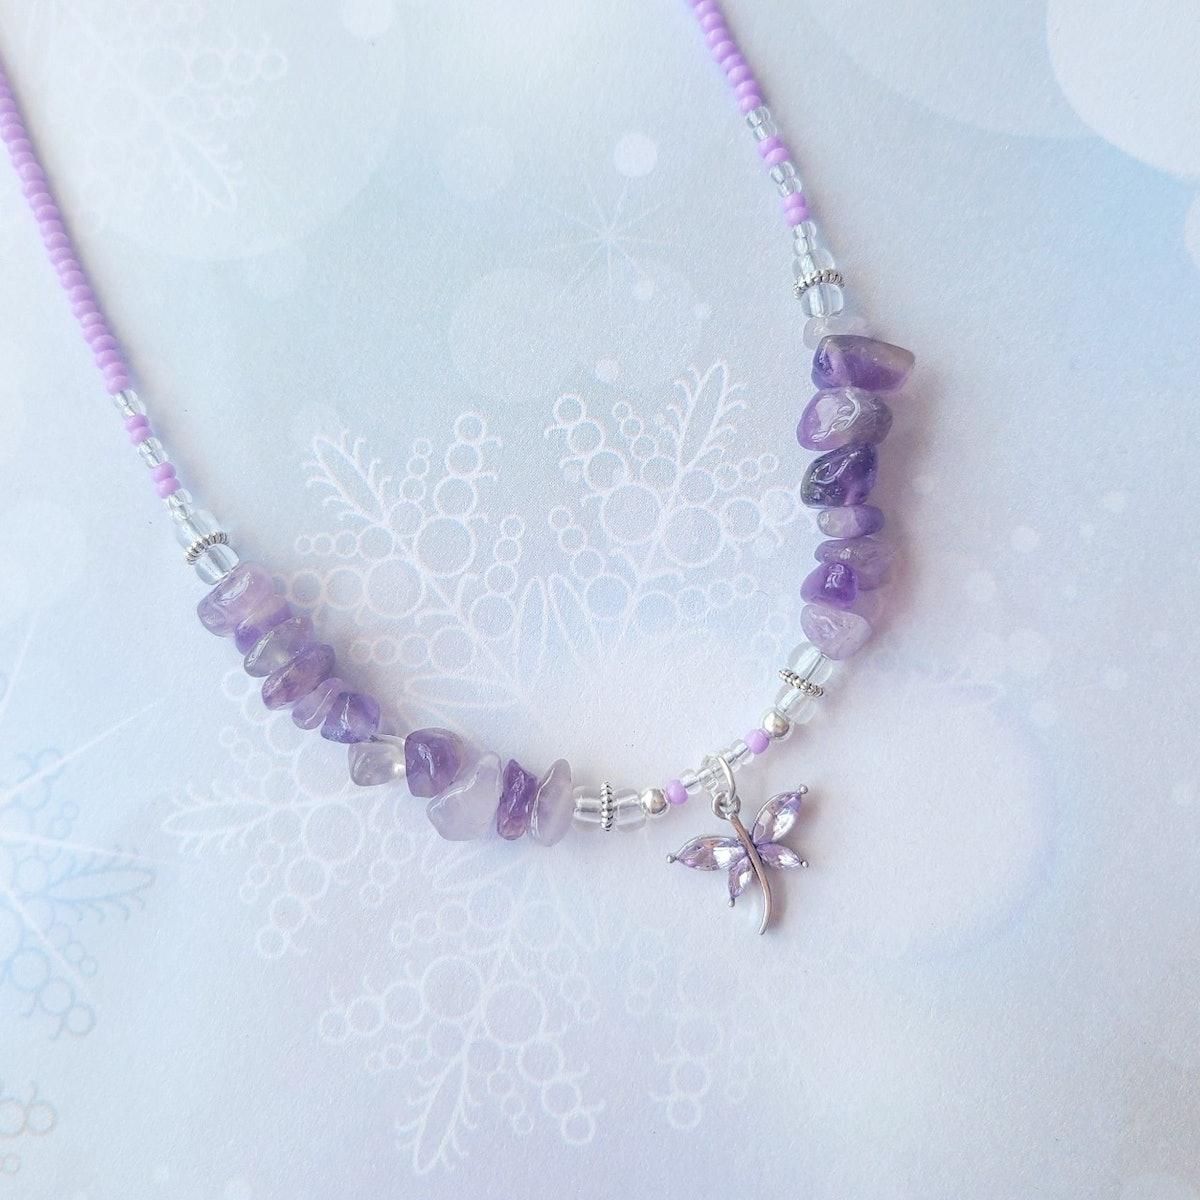 Ceruliestudio Violet Dragonfly Stone Necklace